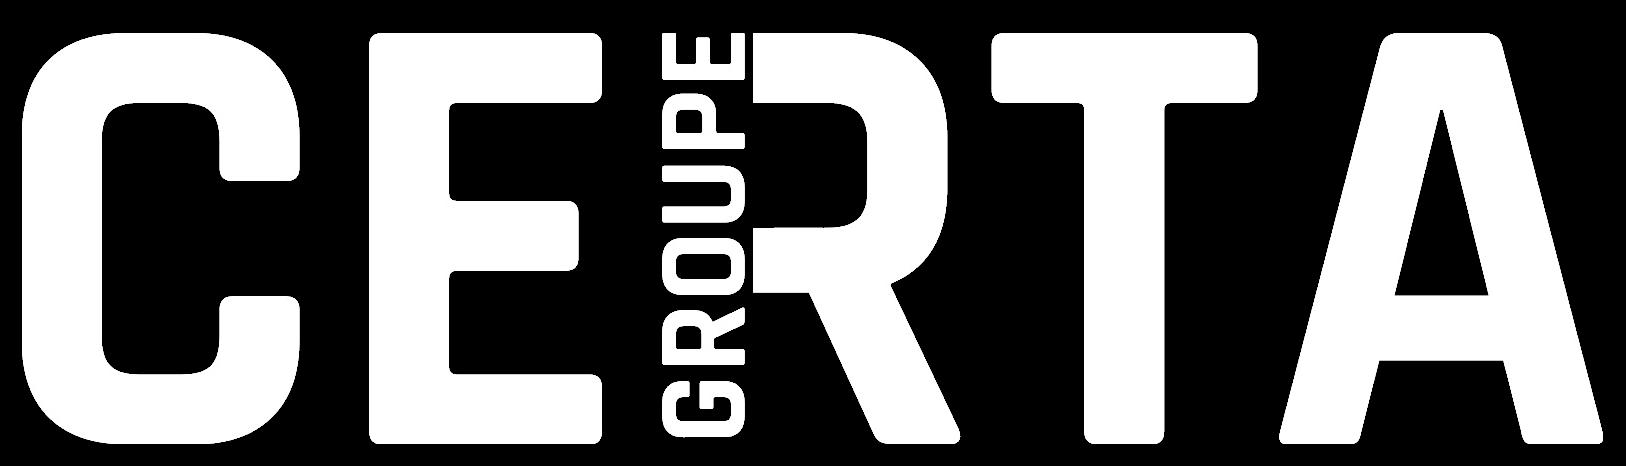 Groupe Certa